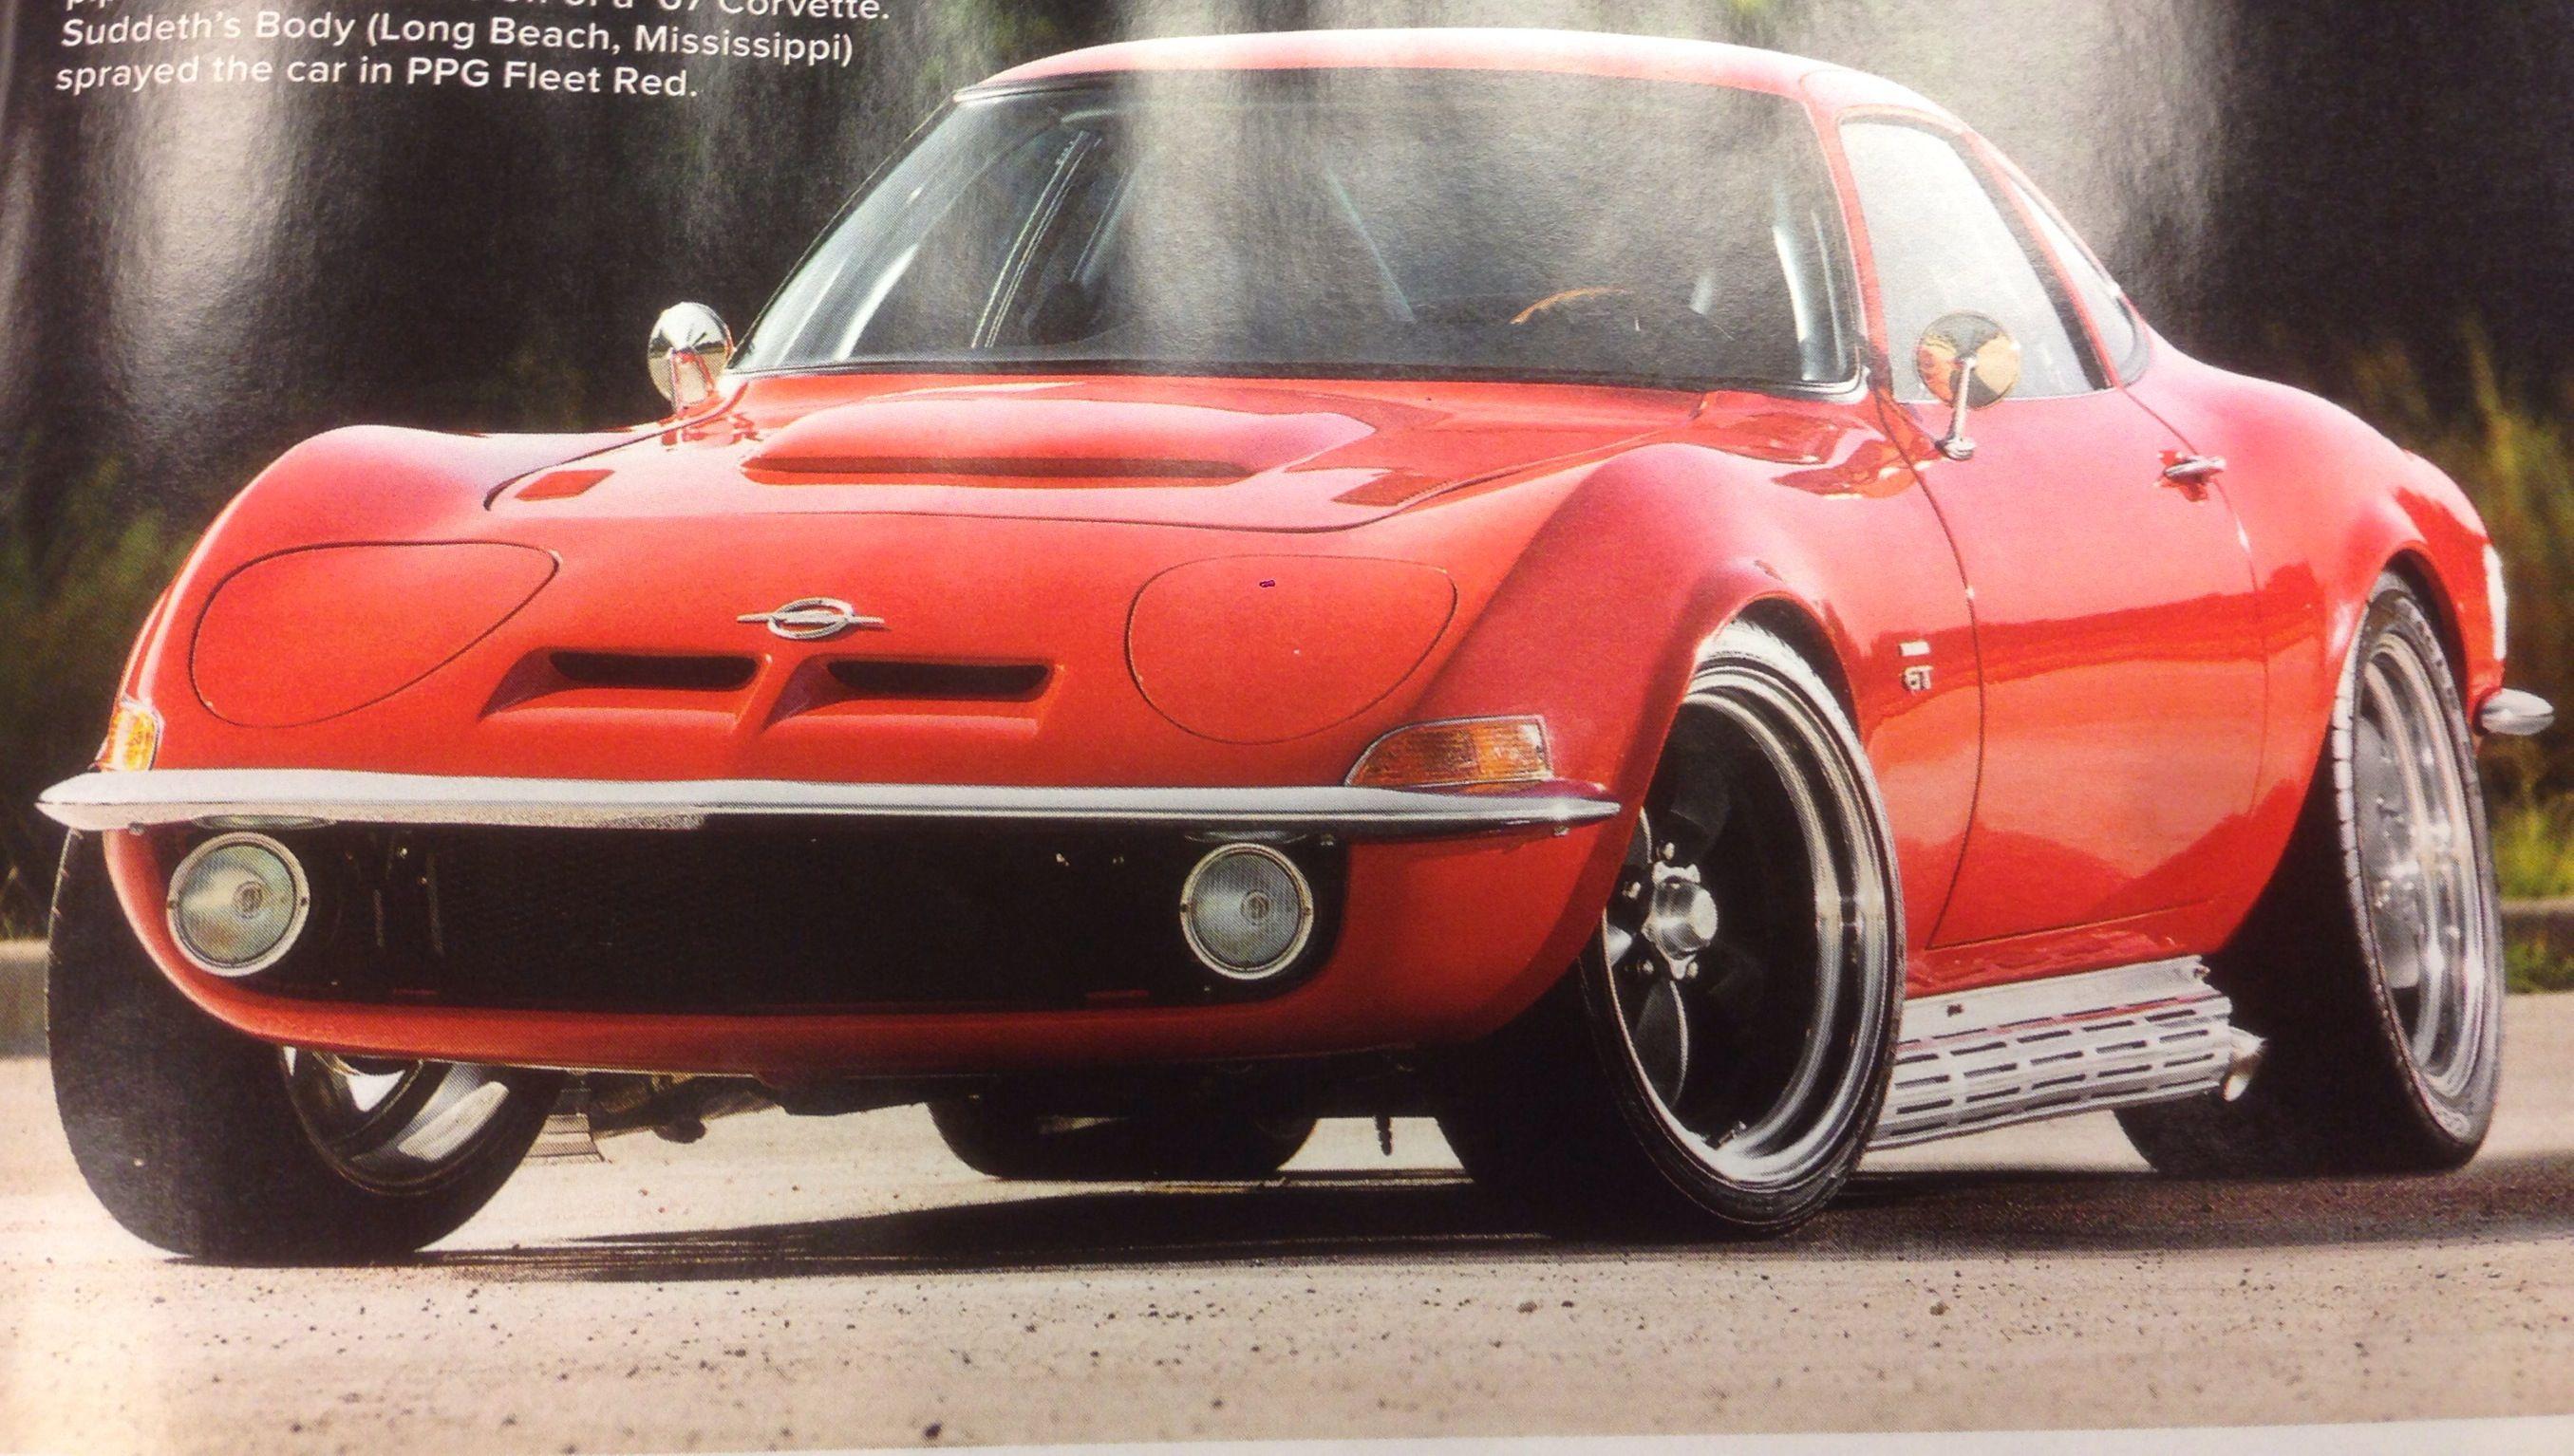 Resto Modded Wild Buick V8 Powered Opel Gt Opel Custom Cars Buick